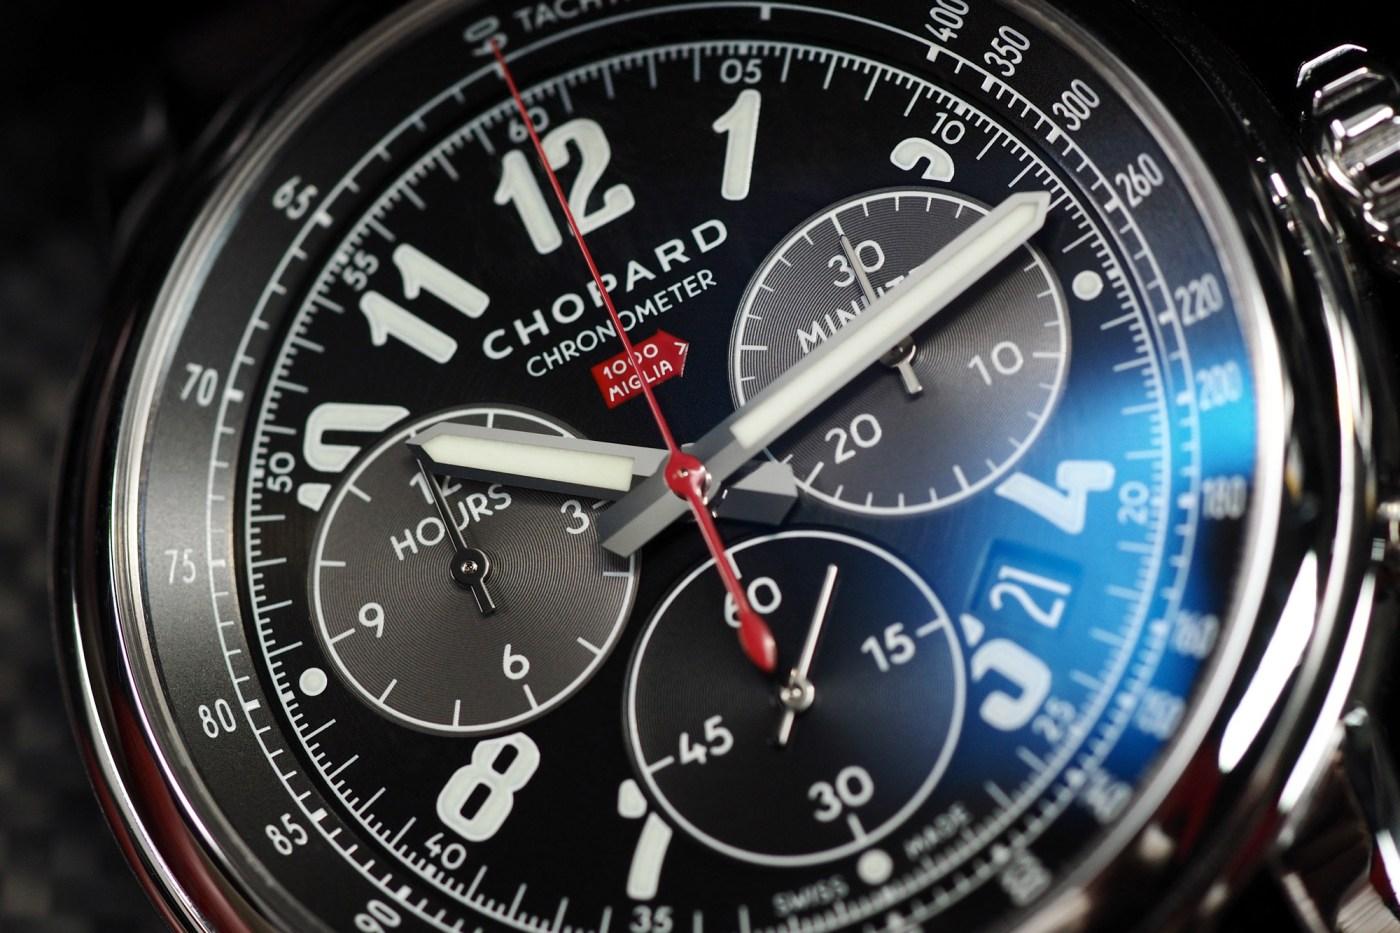 Chopard Mille Miglia 2016 XL Race Edition Chronograp